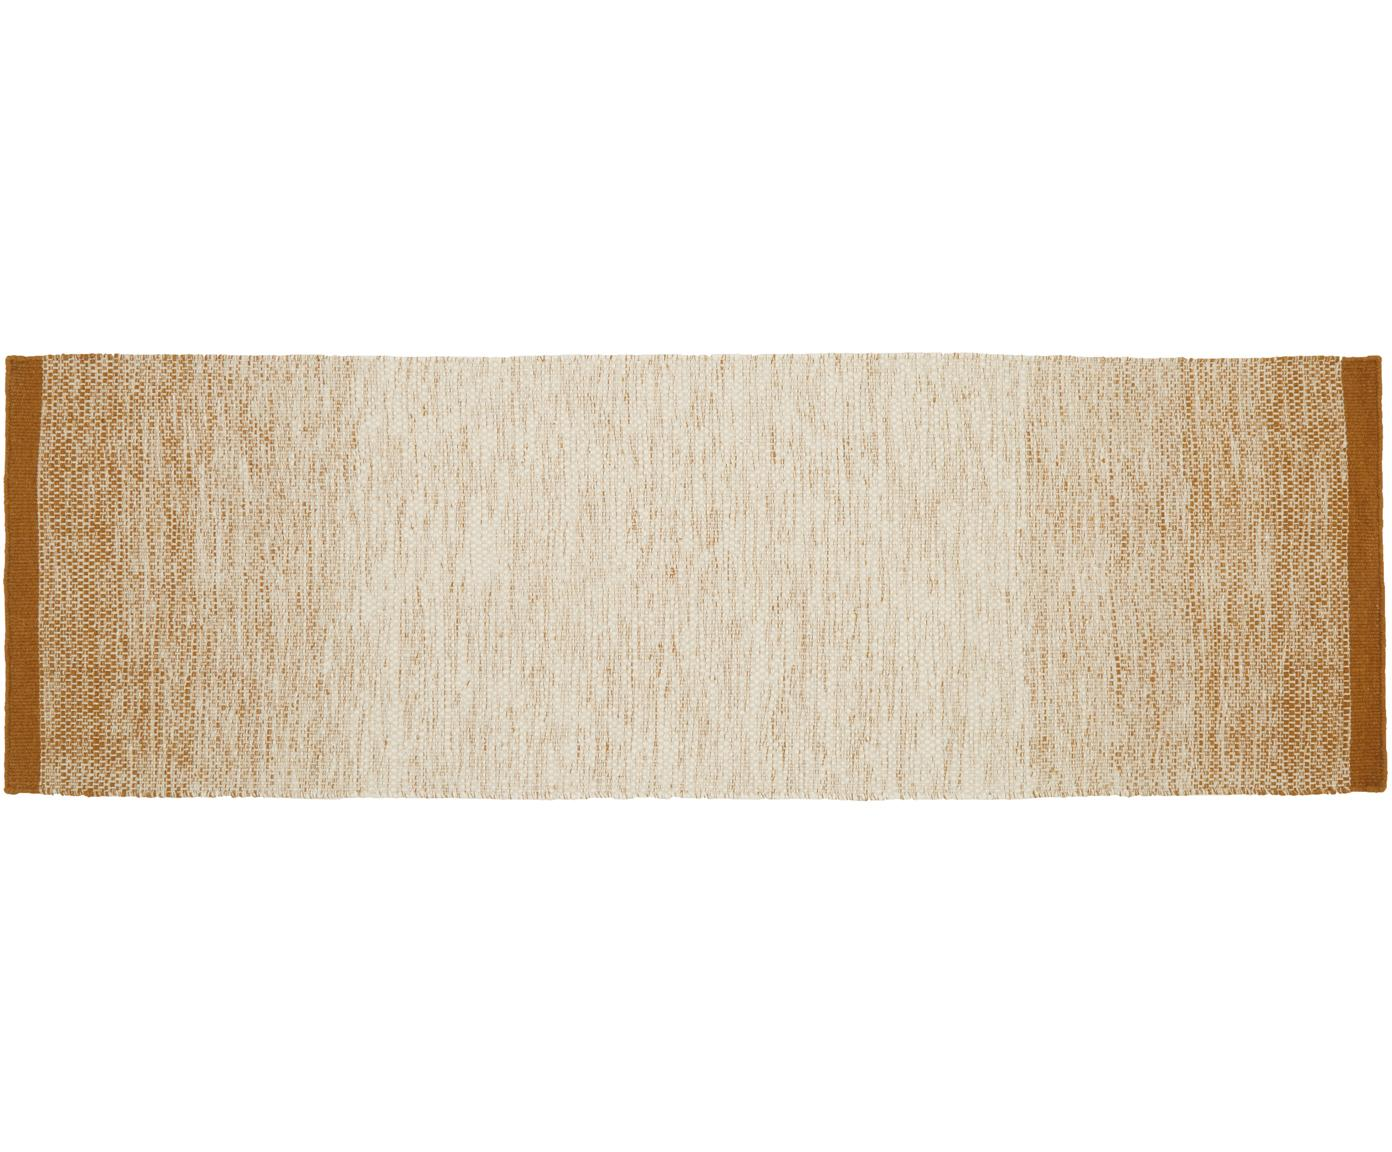 Alfombra artesanal de lana Lule, 70%lana, 30%algodón, Amarillo ocre, beige, An 80 x L 250 cm